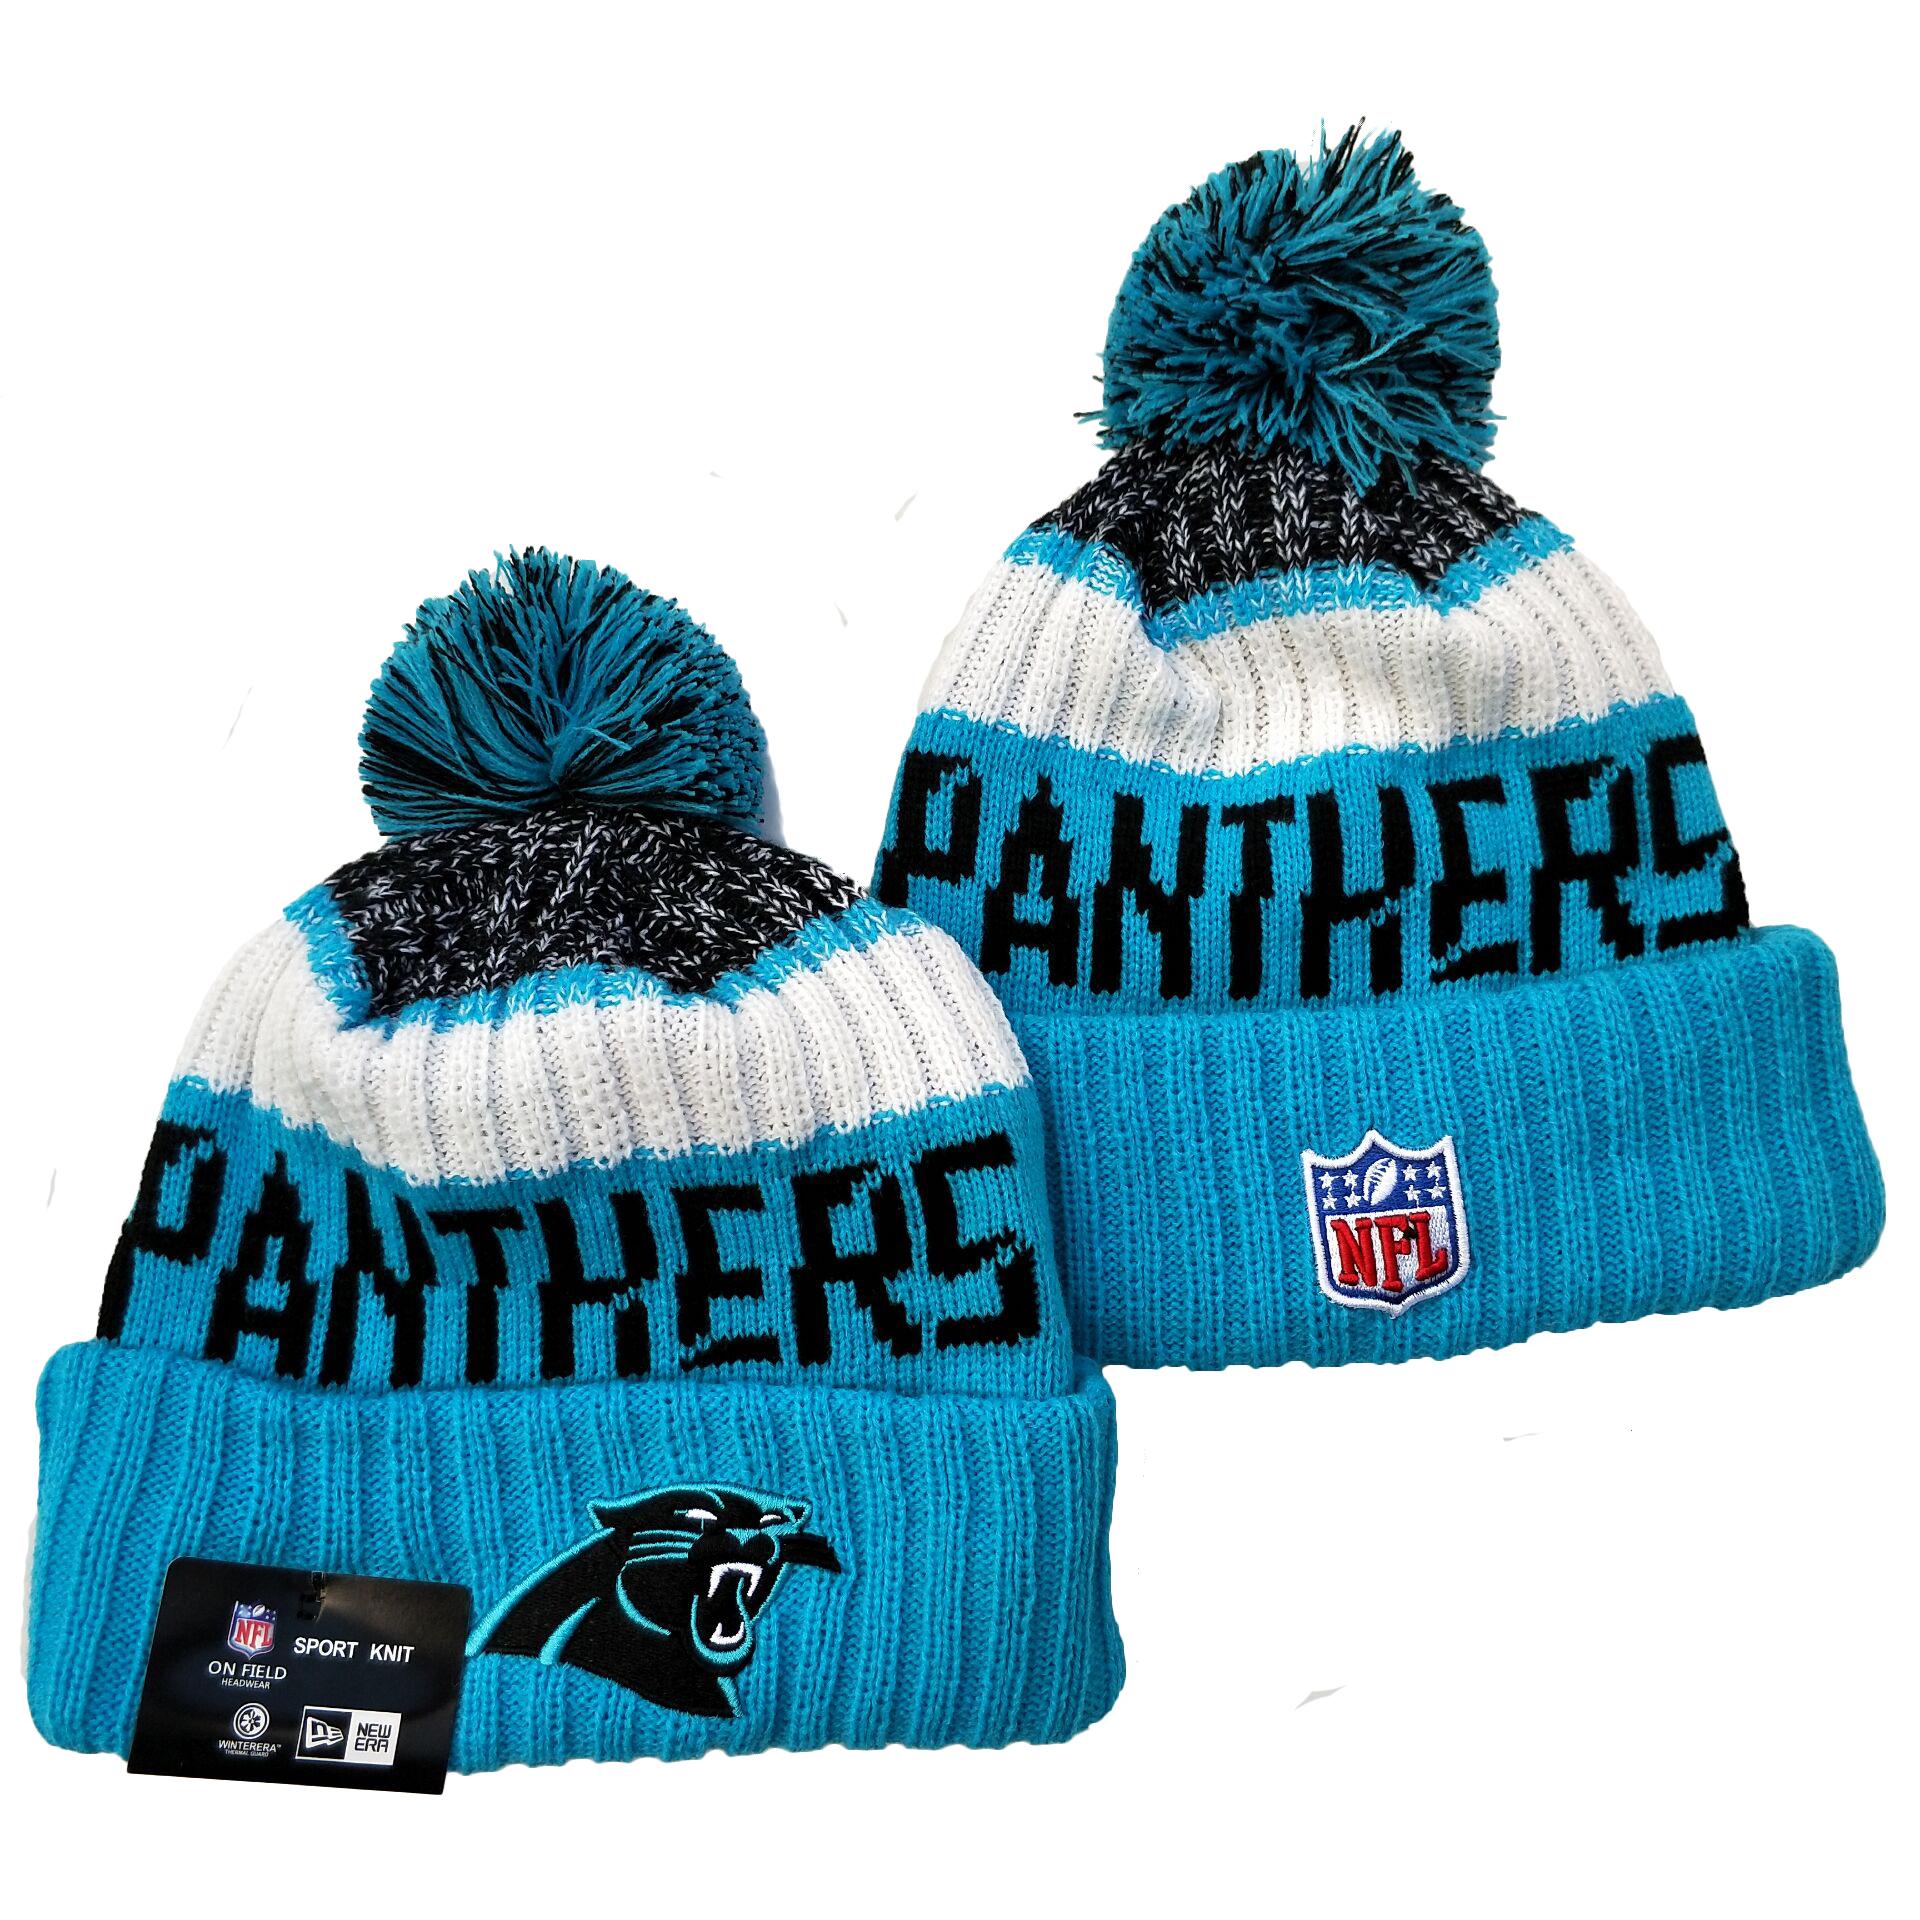 Panthers Team Logo Blue Pom Knit Hat YD